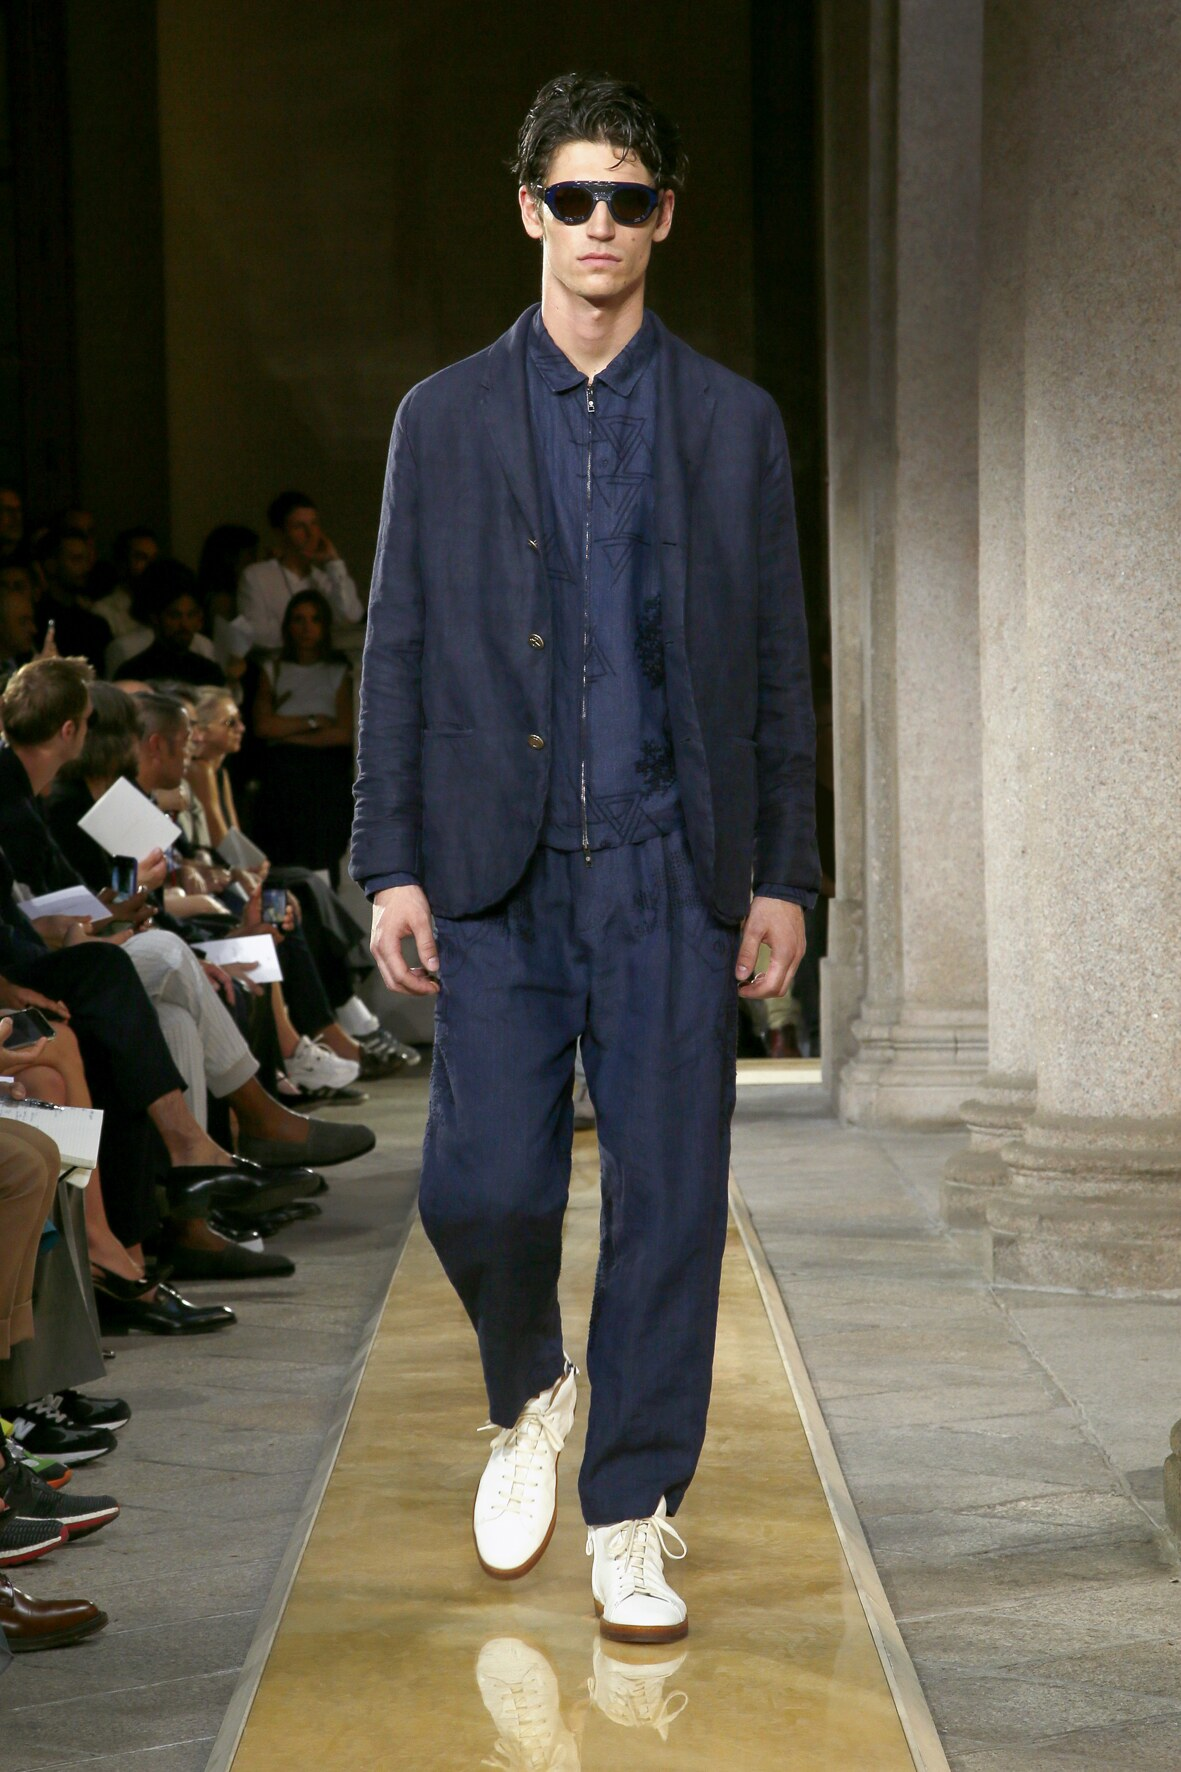 2020 Giorgio Armani Trends Milan Fashion Week